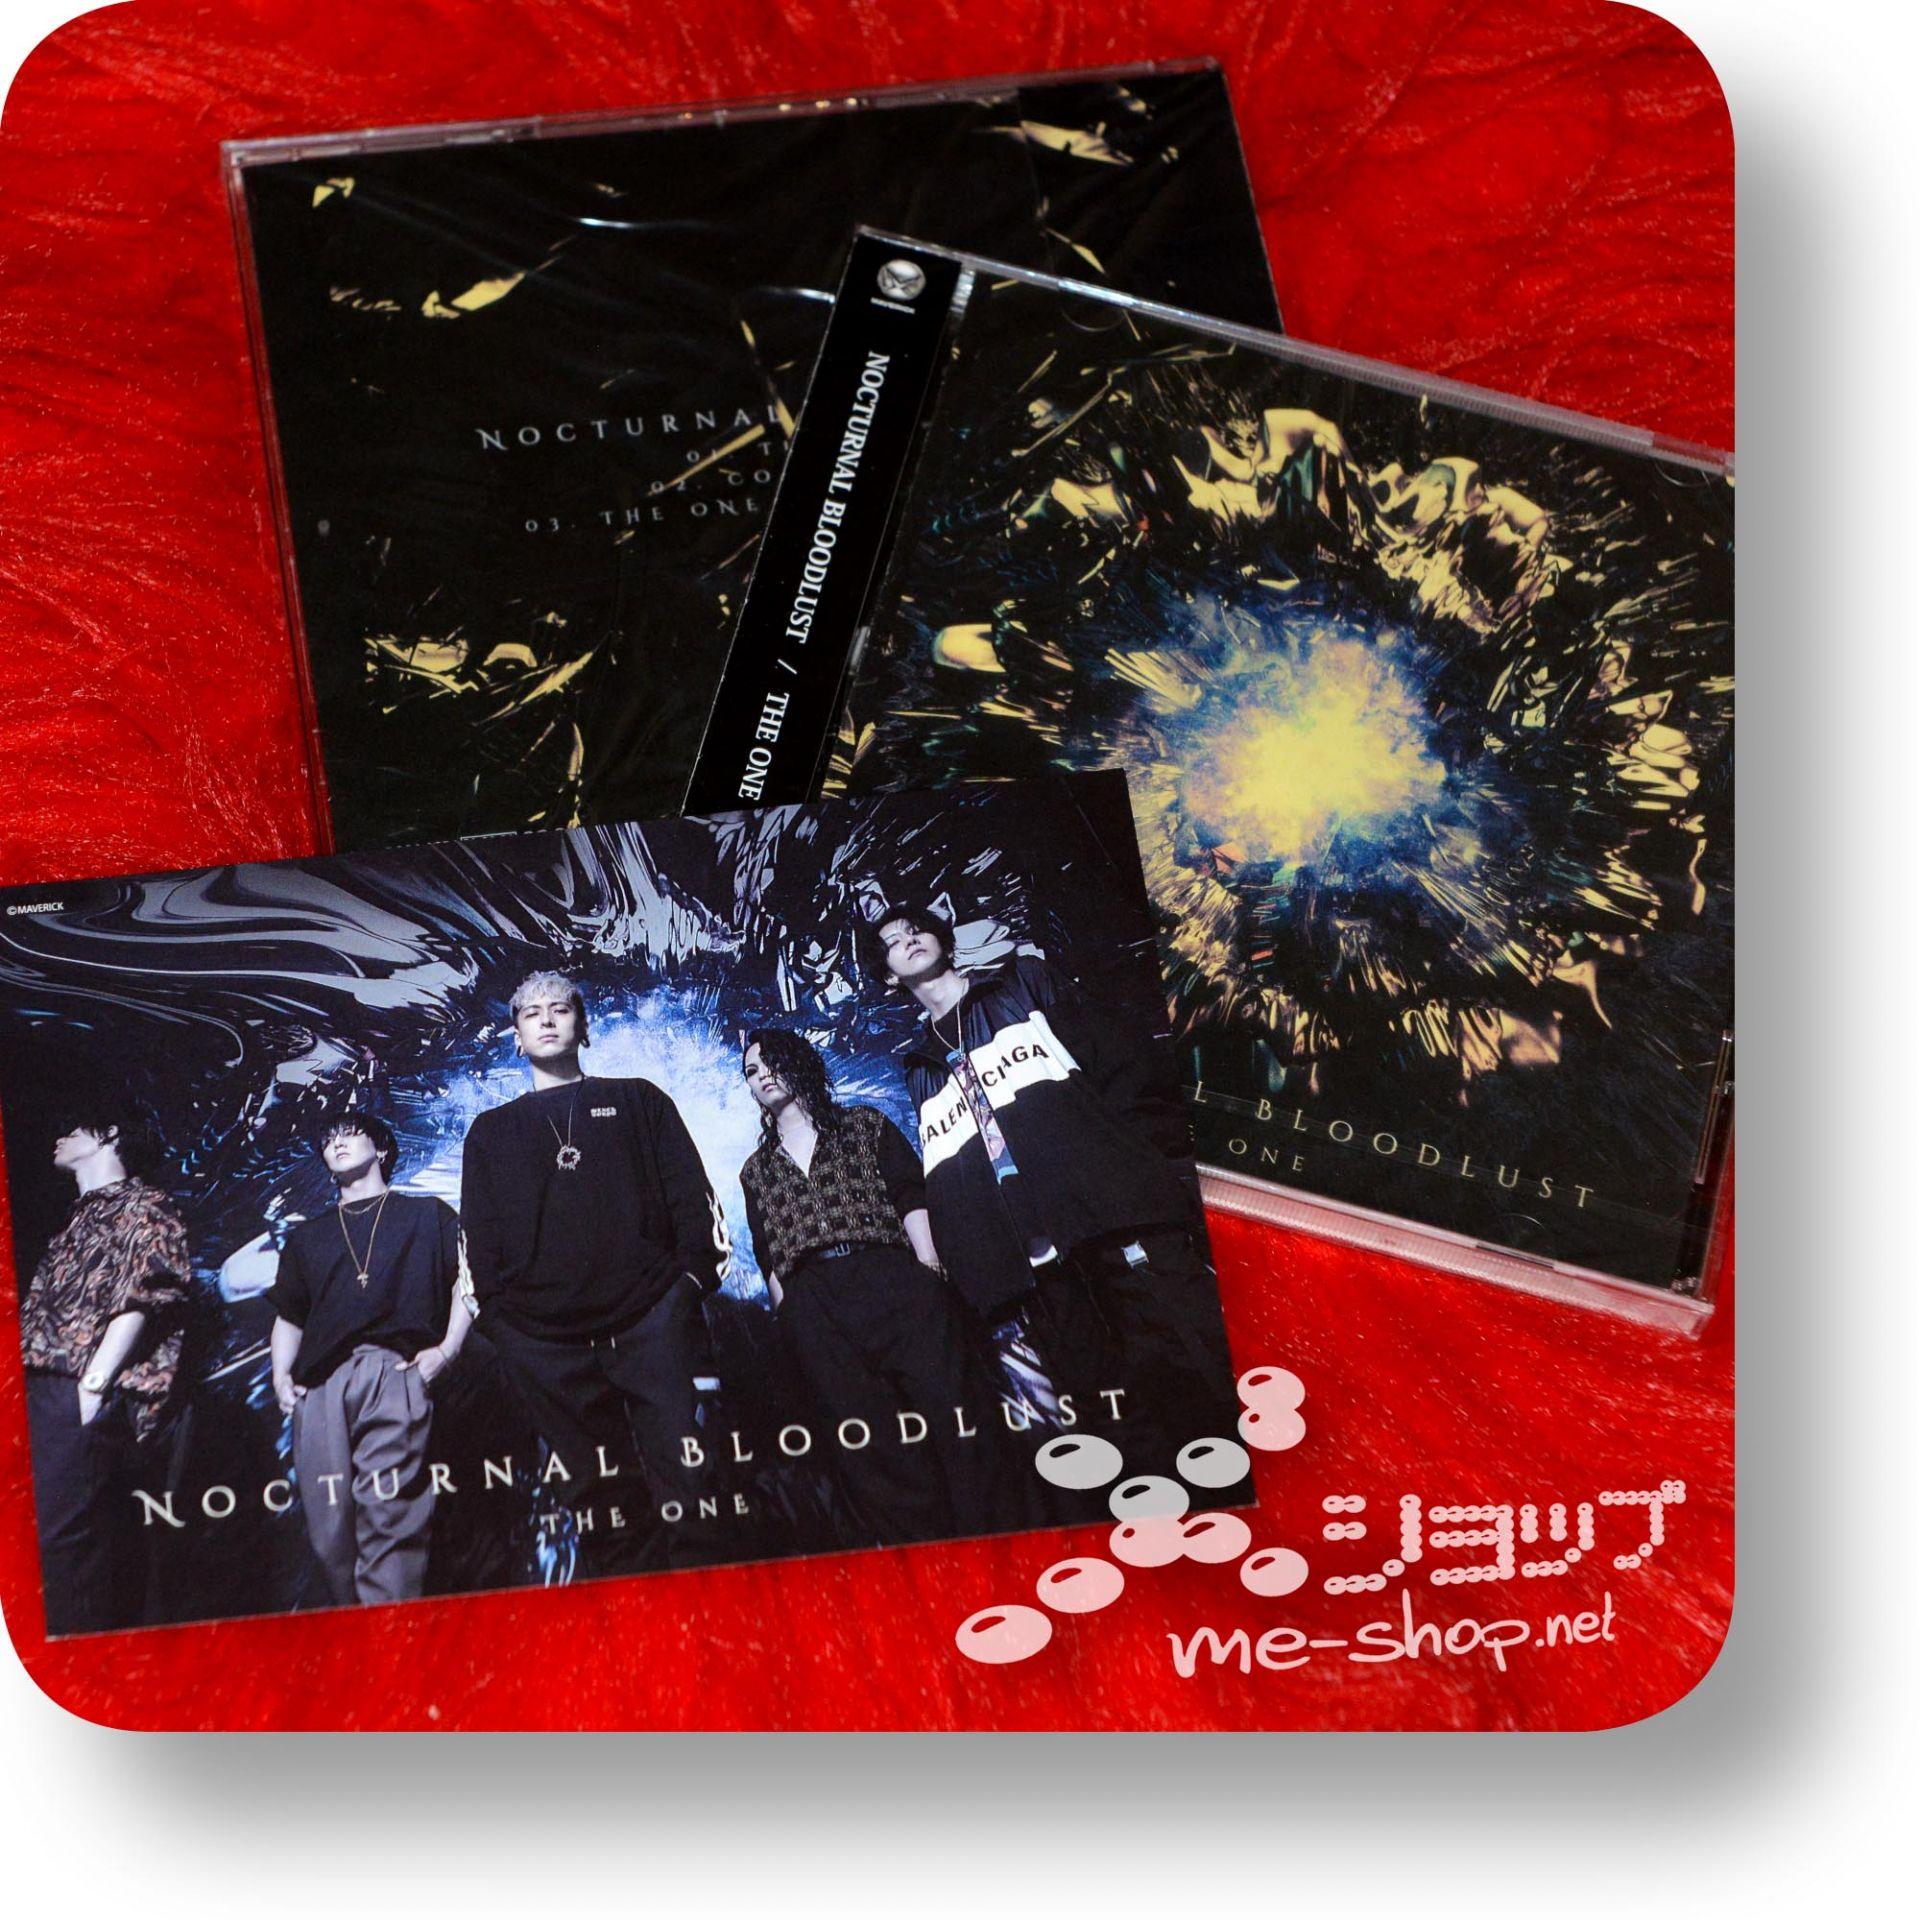 nocturnal bloodlust the one+bonus